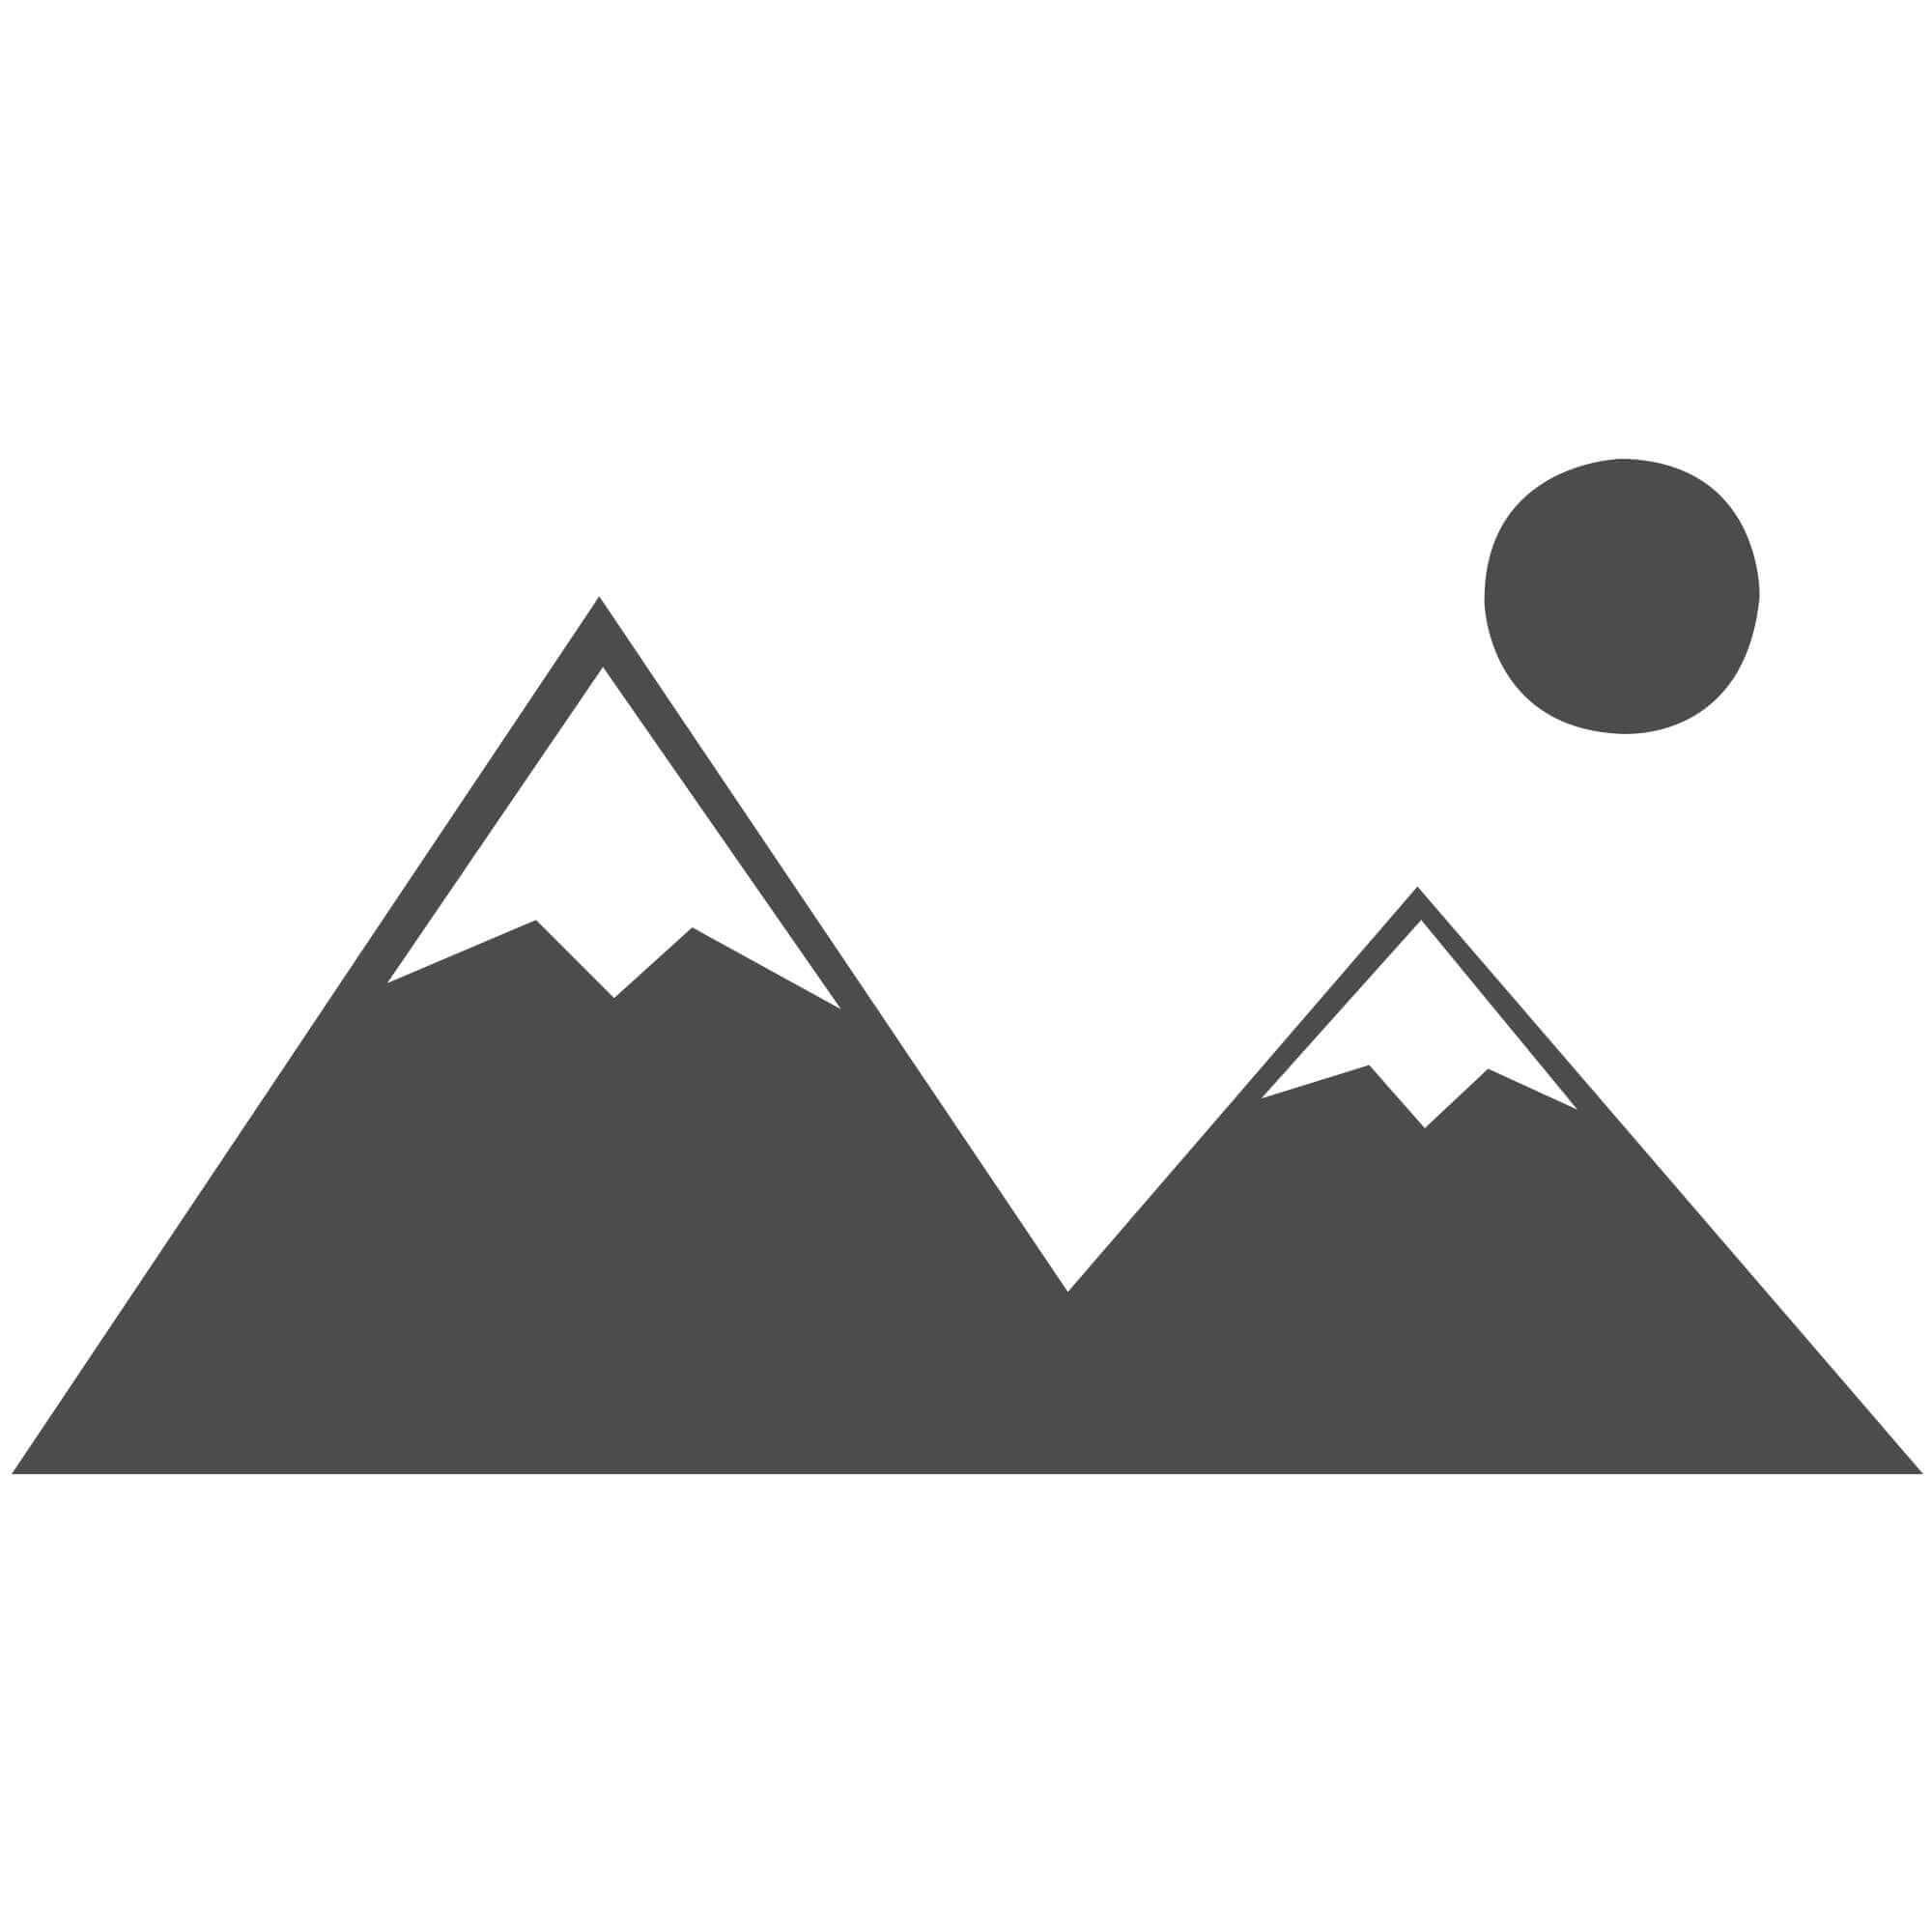 "Florence Alfresco Moretti Rug - Beige Anthracite - Size 200 x 290 cm (6'7"" x 9'6"")"